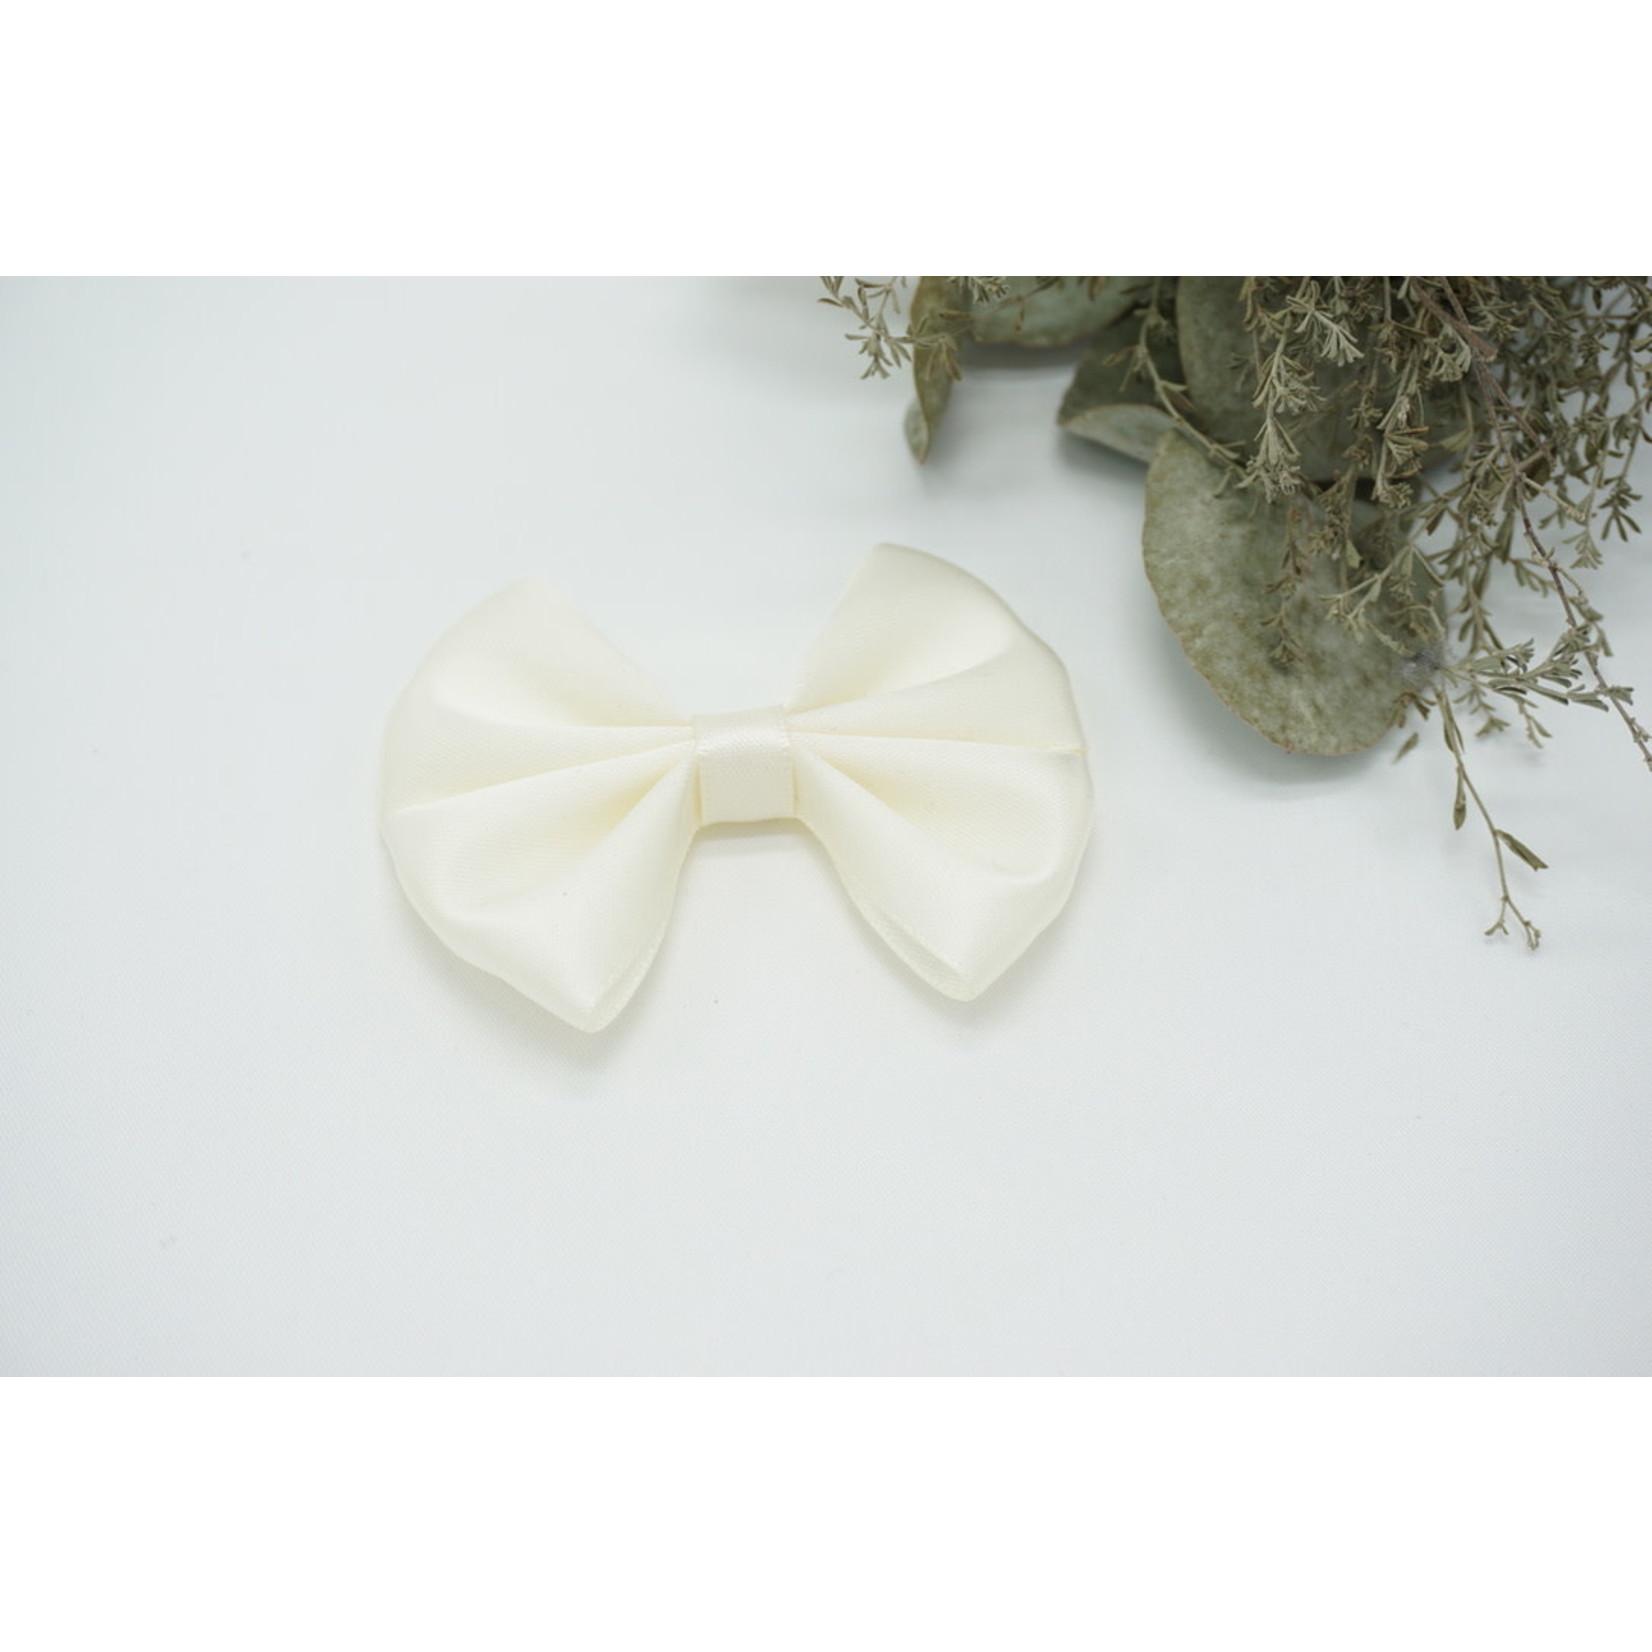 Petite Zara Satin Bow  - Ivory